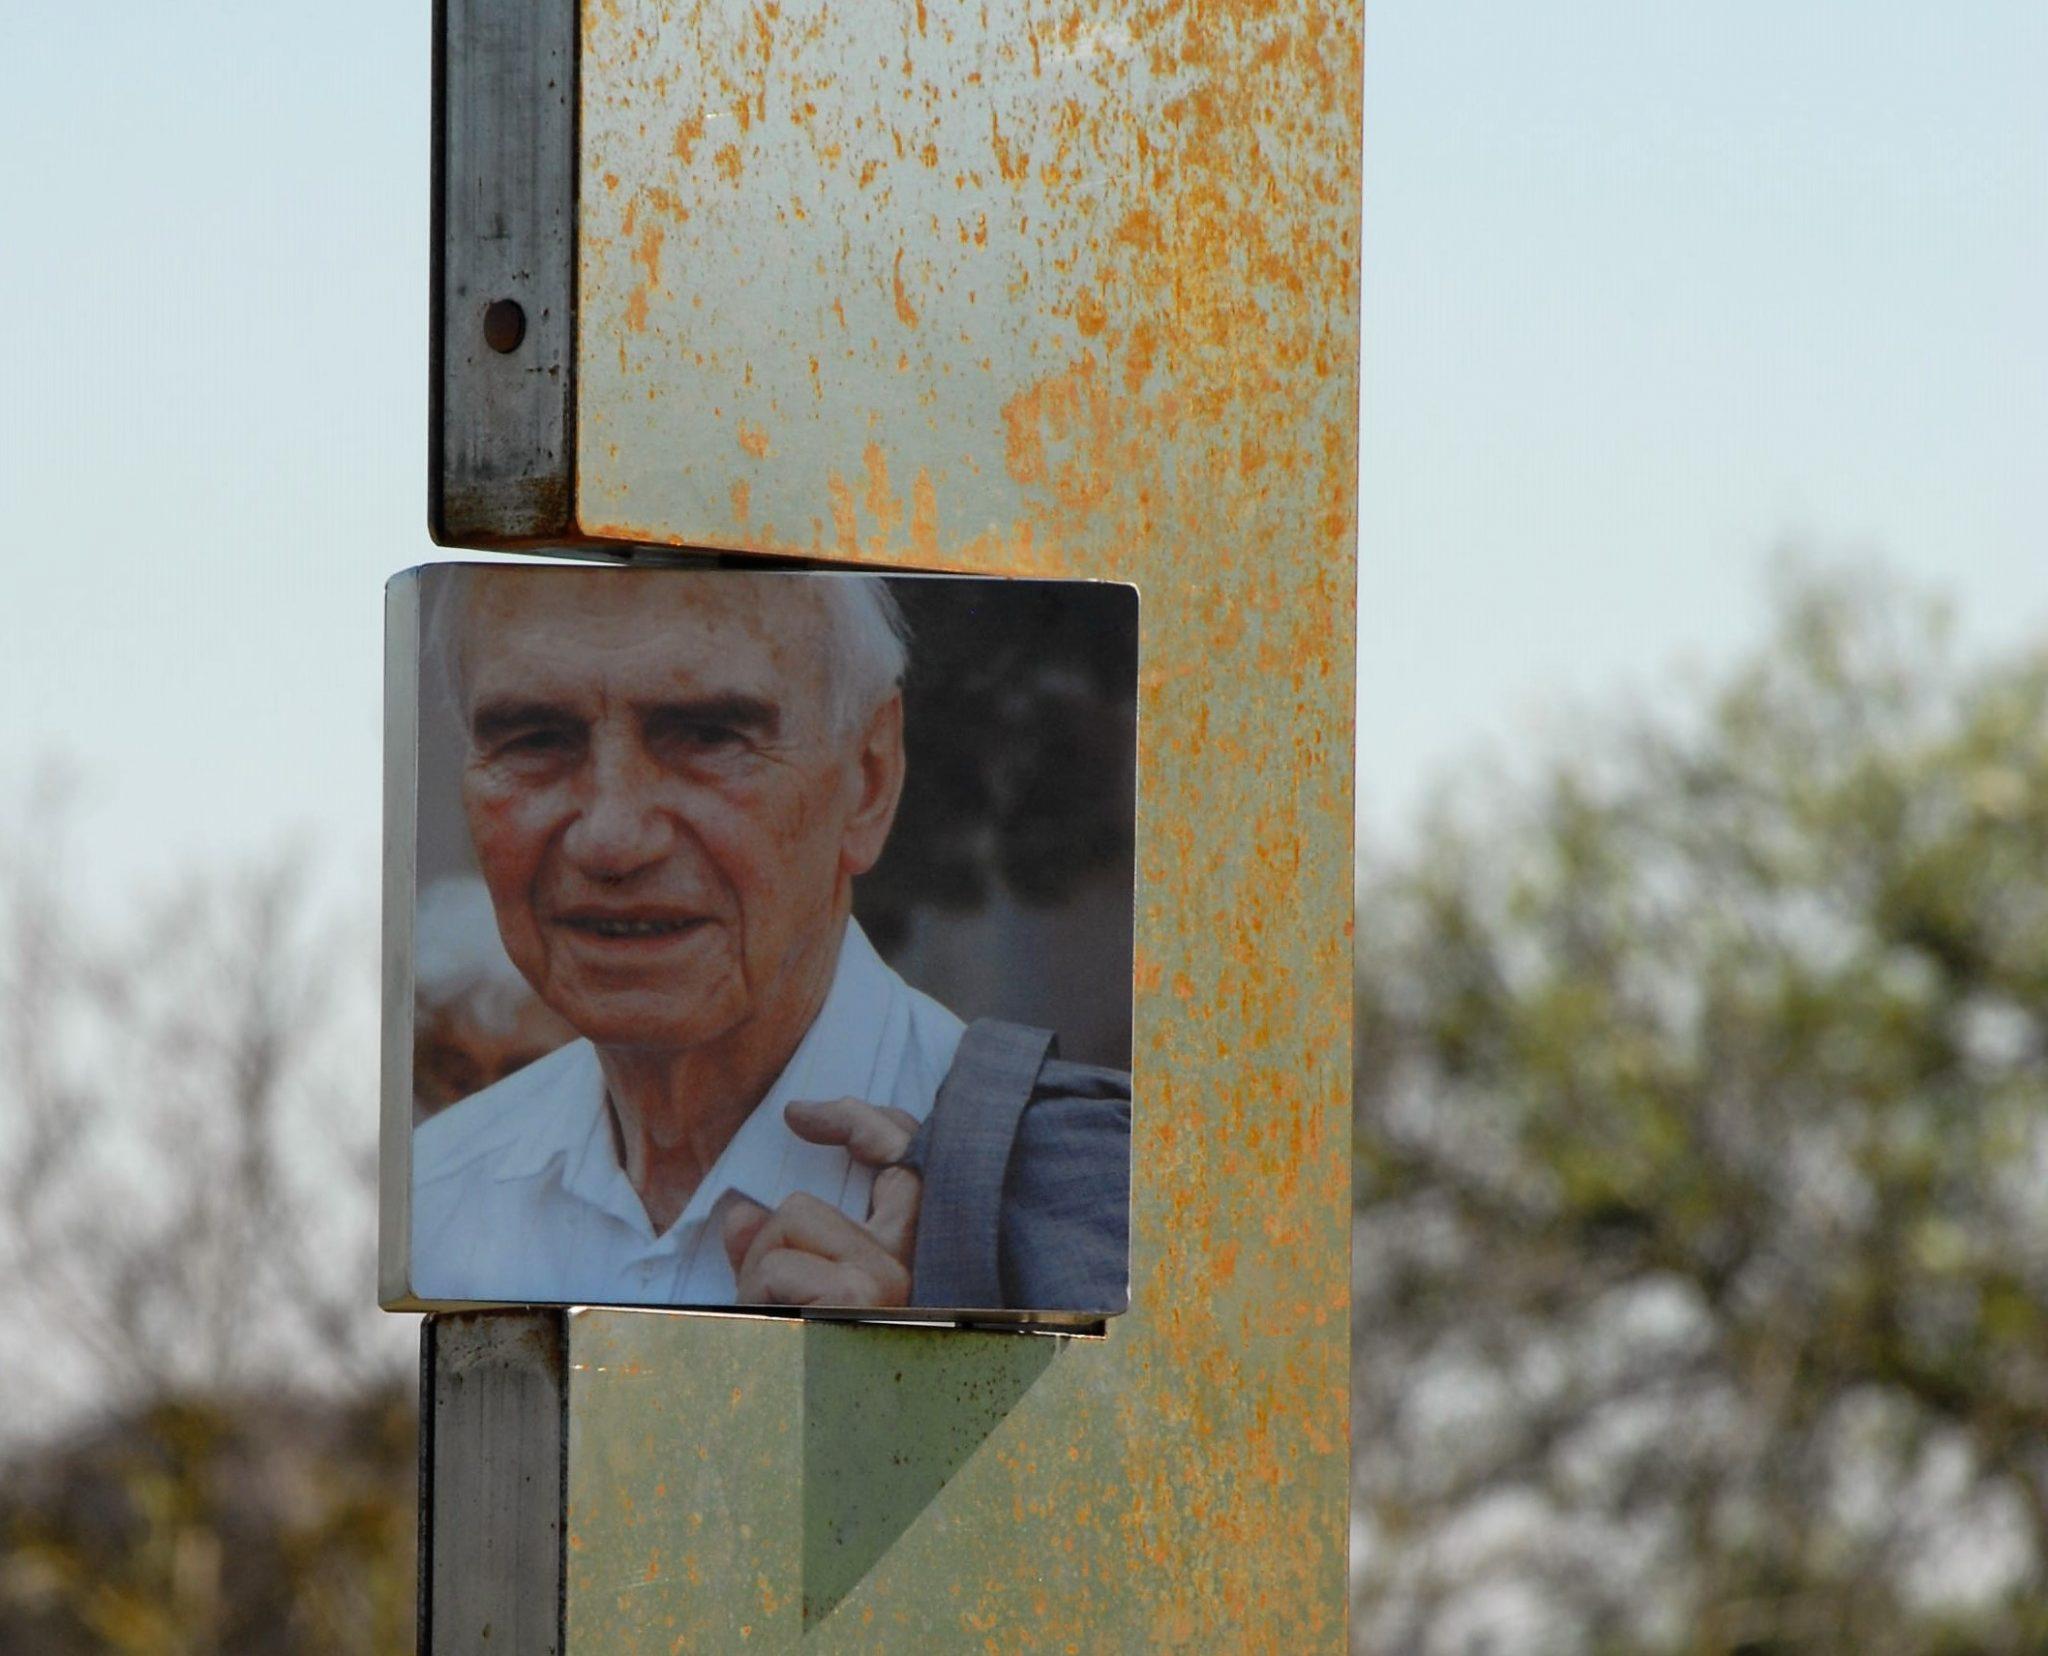 Kirchschläger Porträtwürfel